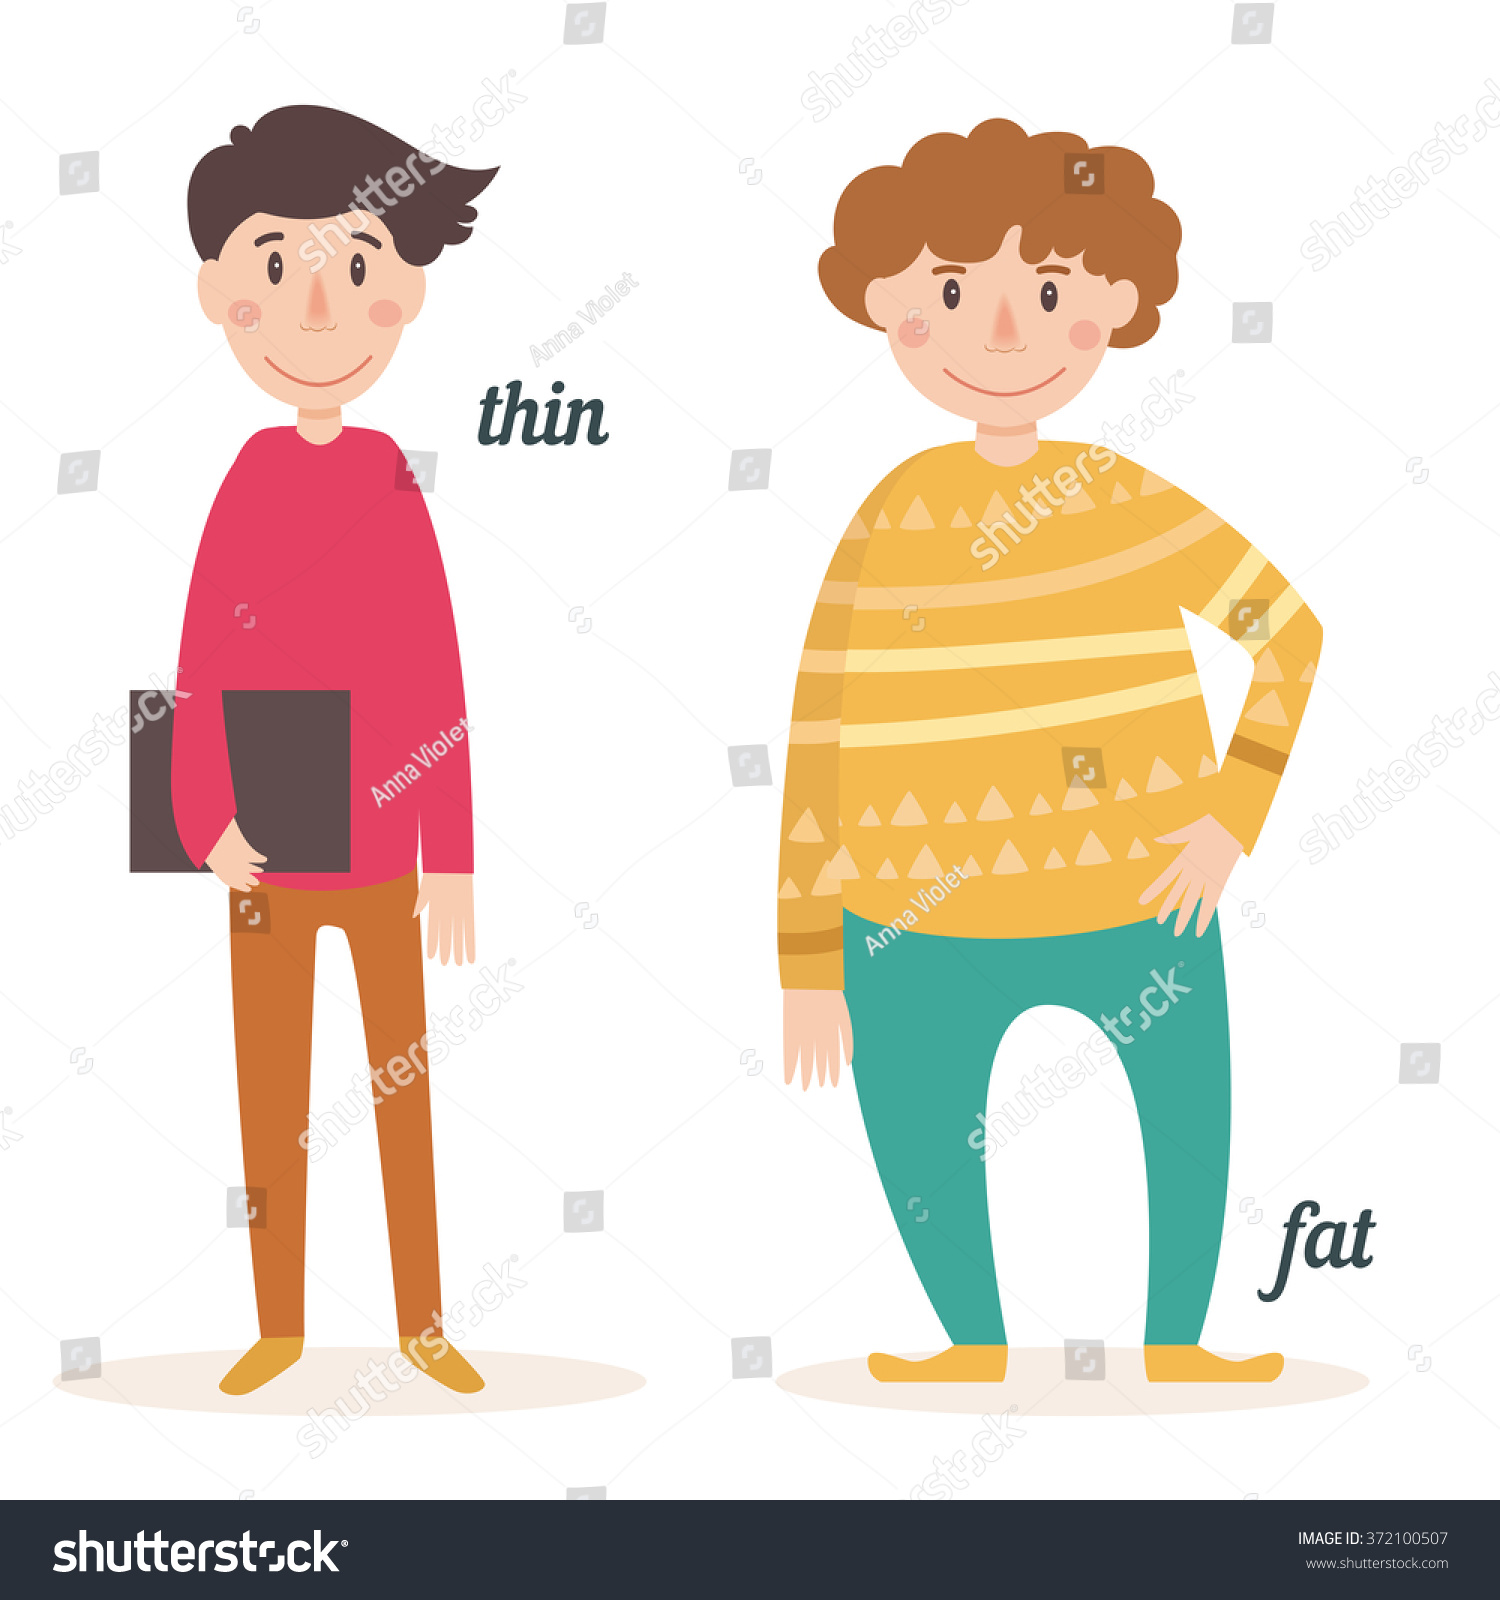 Antonyms People Fat Thin Card Children Stock Vector